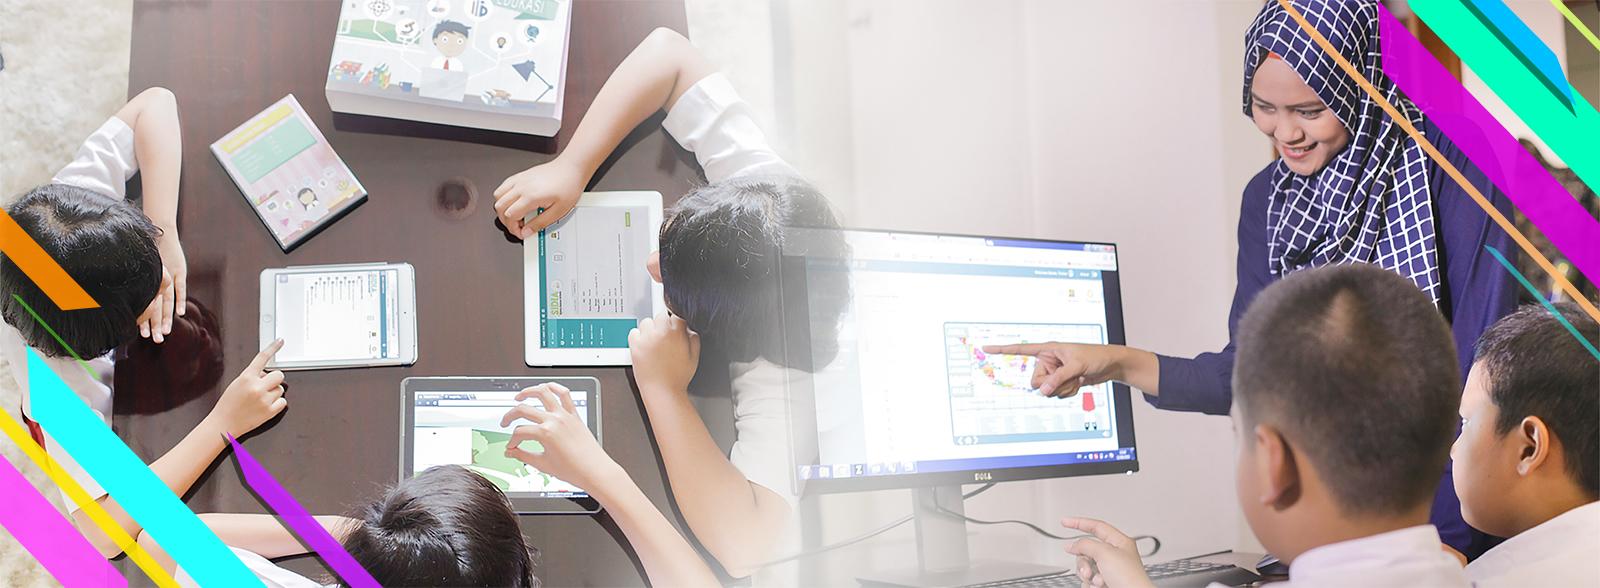 Software Aplikasi RPP dan Silabus Terlengkap SD dan SMP Lengkap - SIDIA